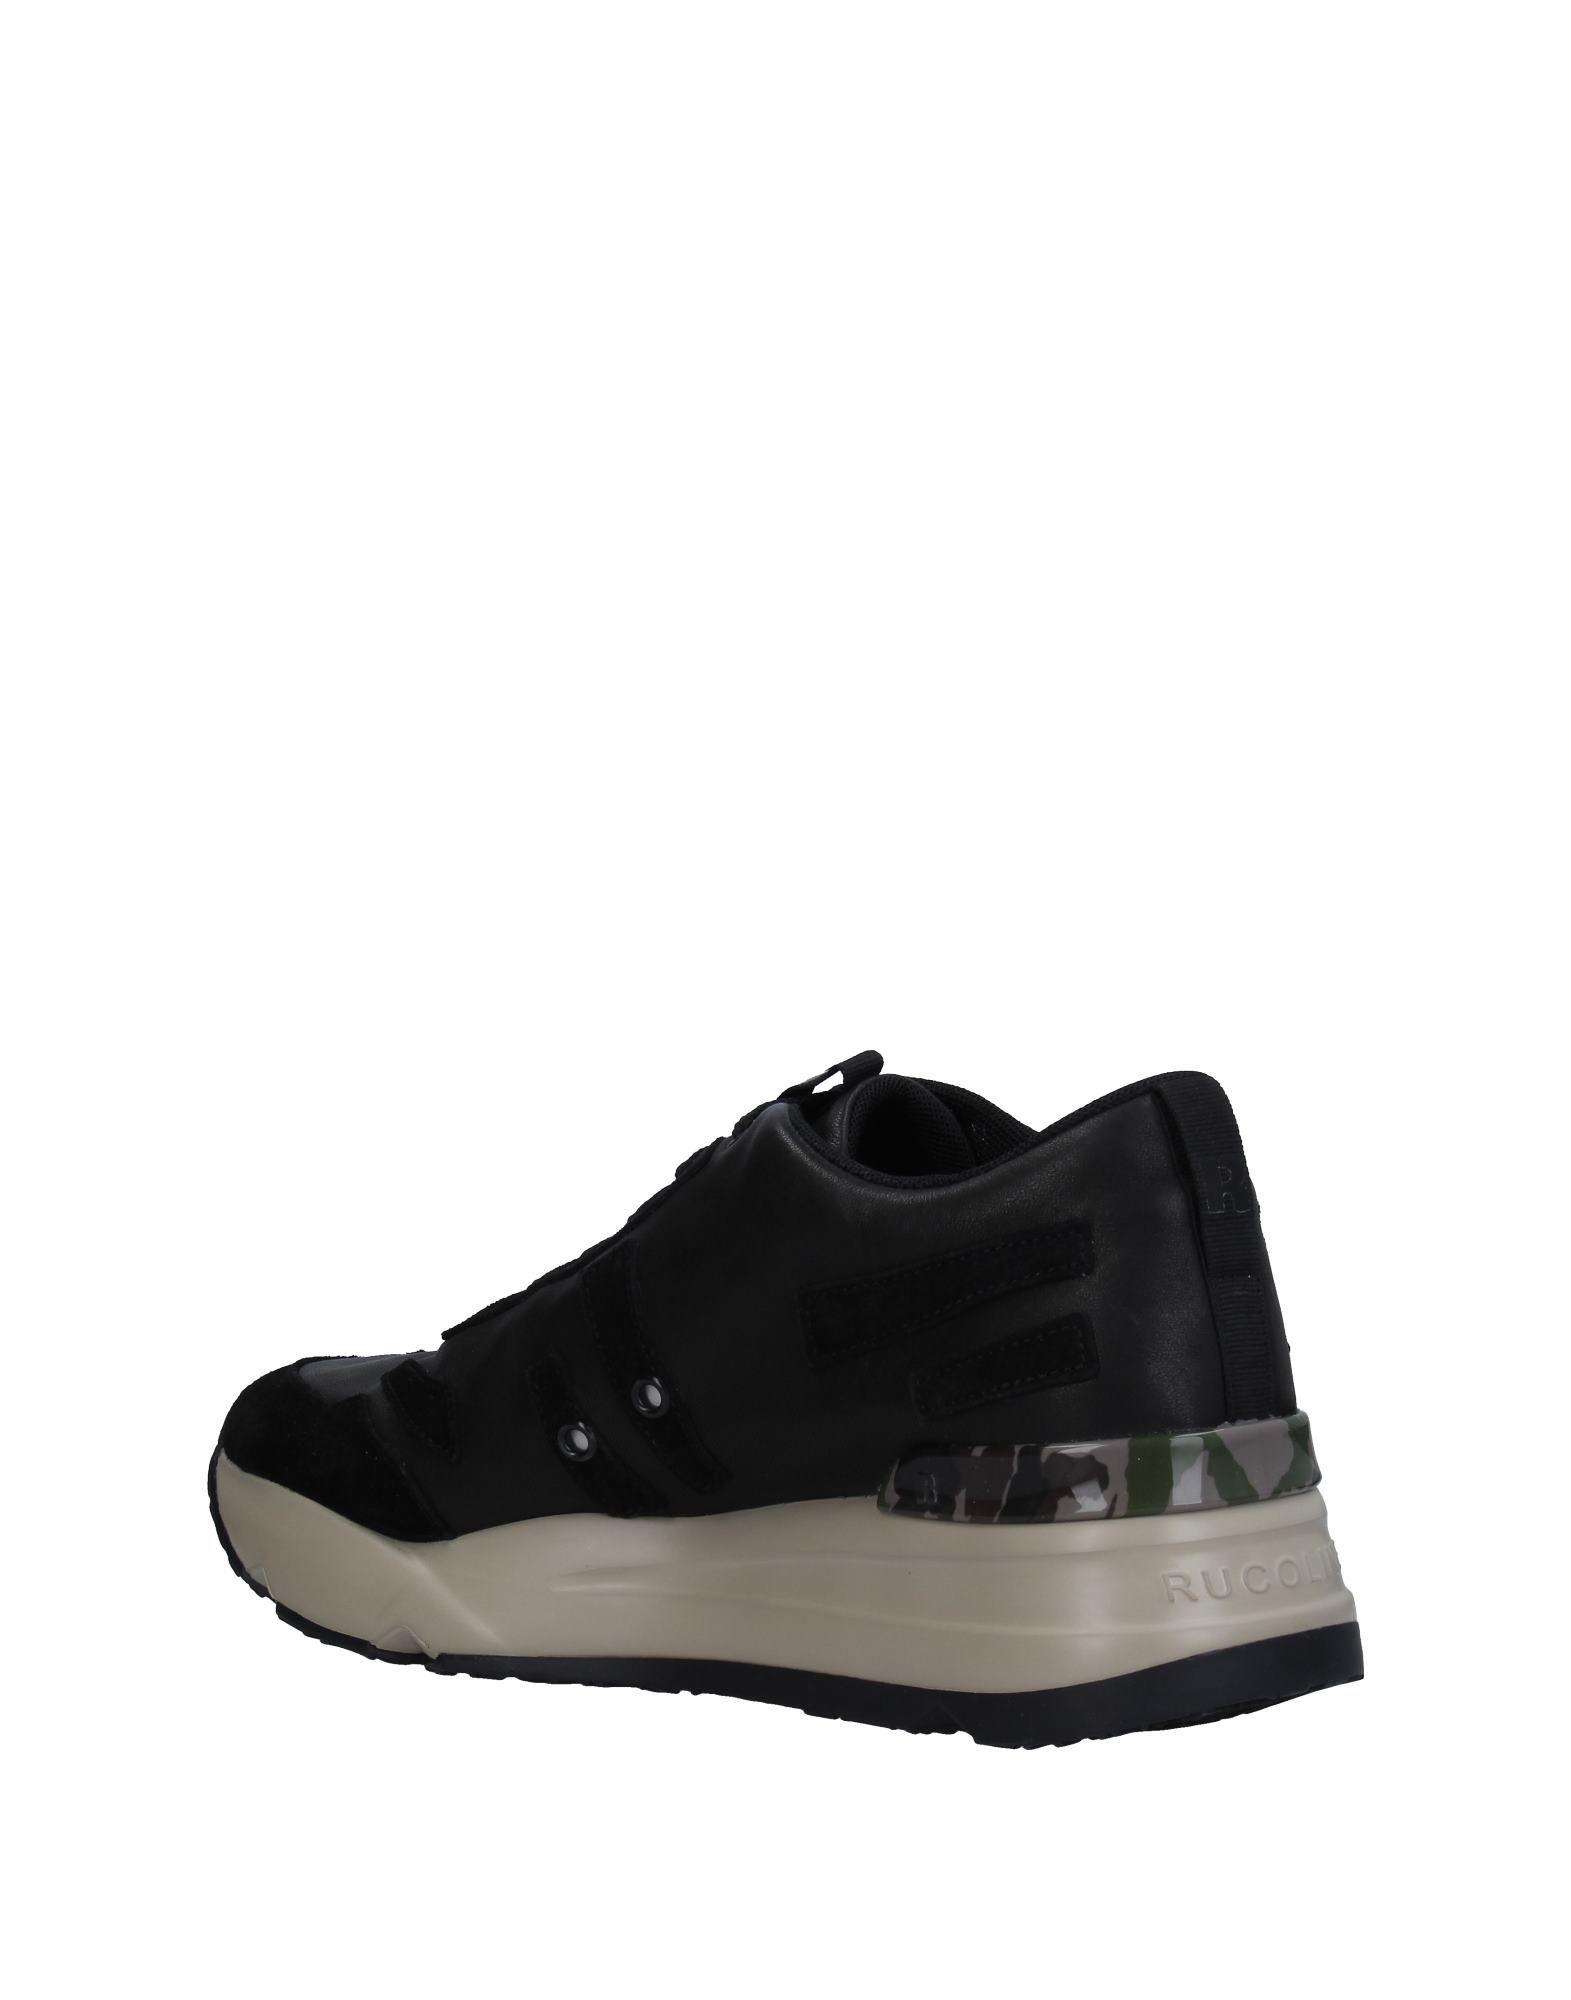 Ruco Sneakers Line Sneakers Ruco Herren  11335497VT 2be321